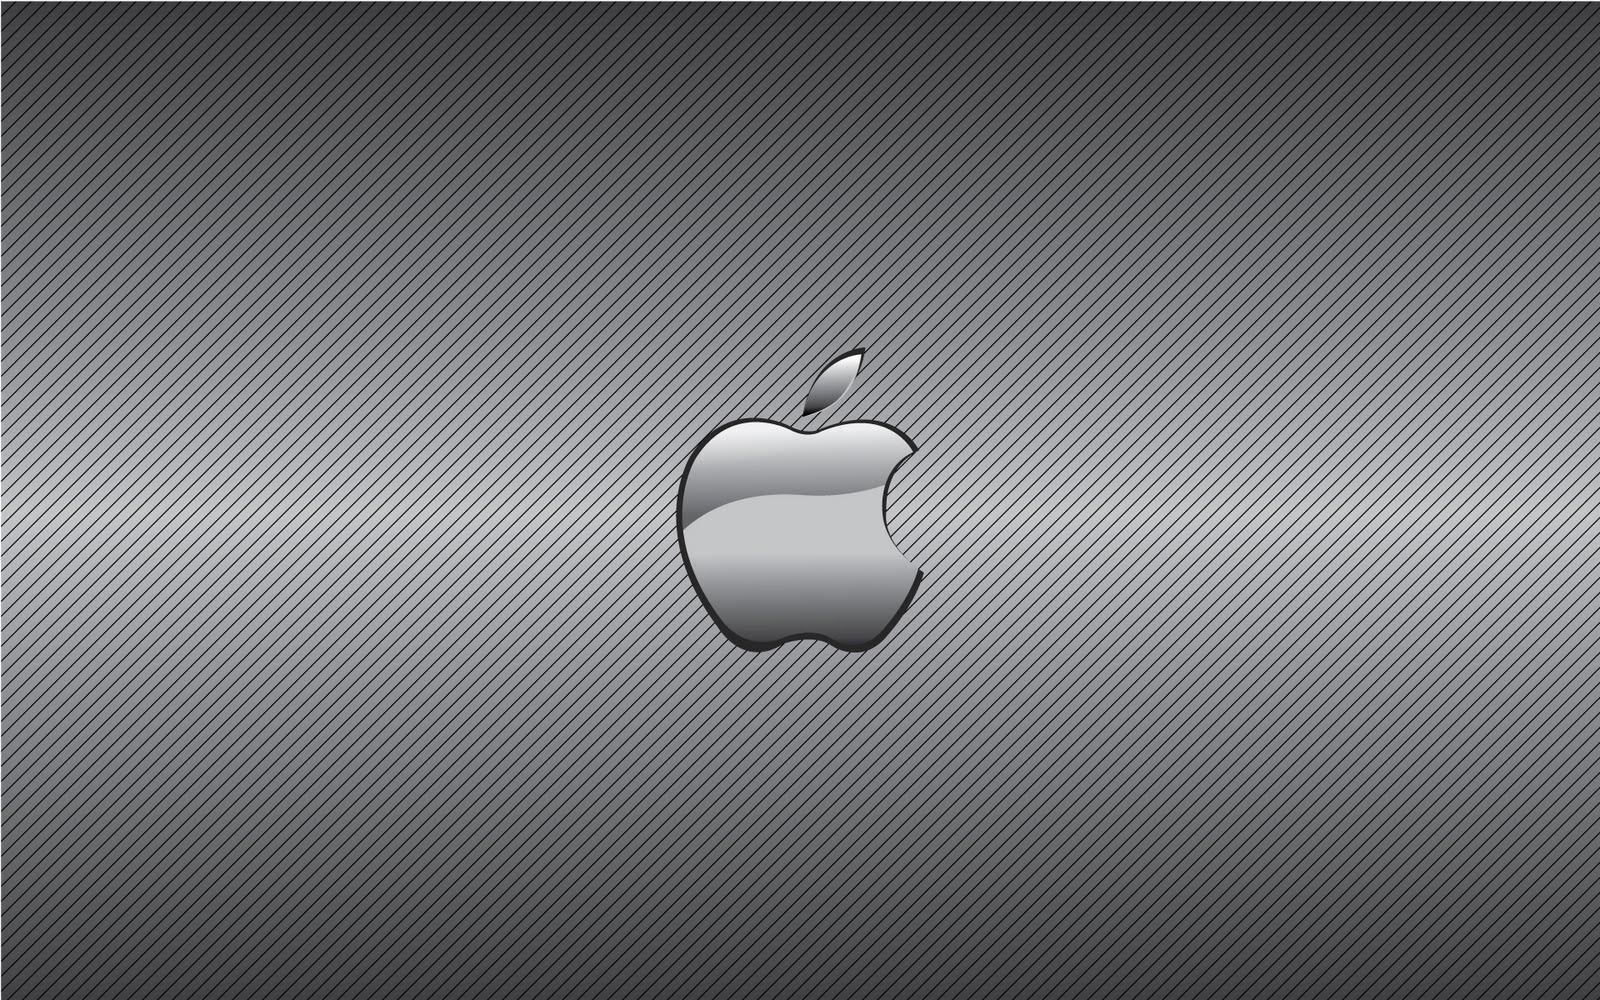 http://3.bp.blogspot.com/_NxpJ5_Df1p8/TT15bmH3MtI/AAAAAAAAAD8/50spQK9Vj88/s1600/Apple_wallpaper_by_Muzika08_Vector.jpg